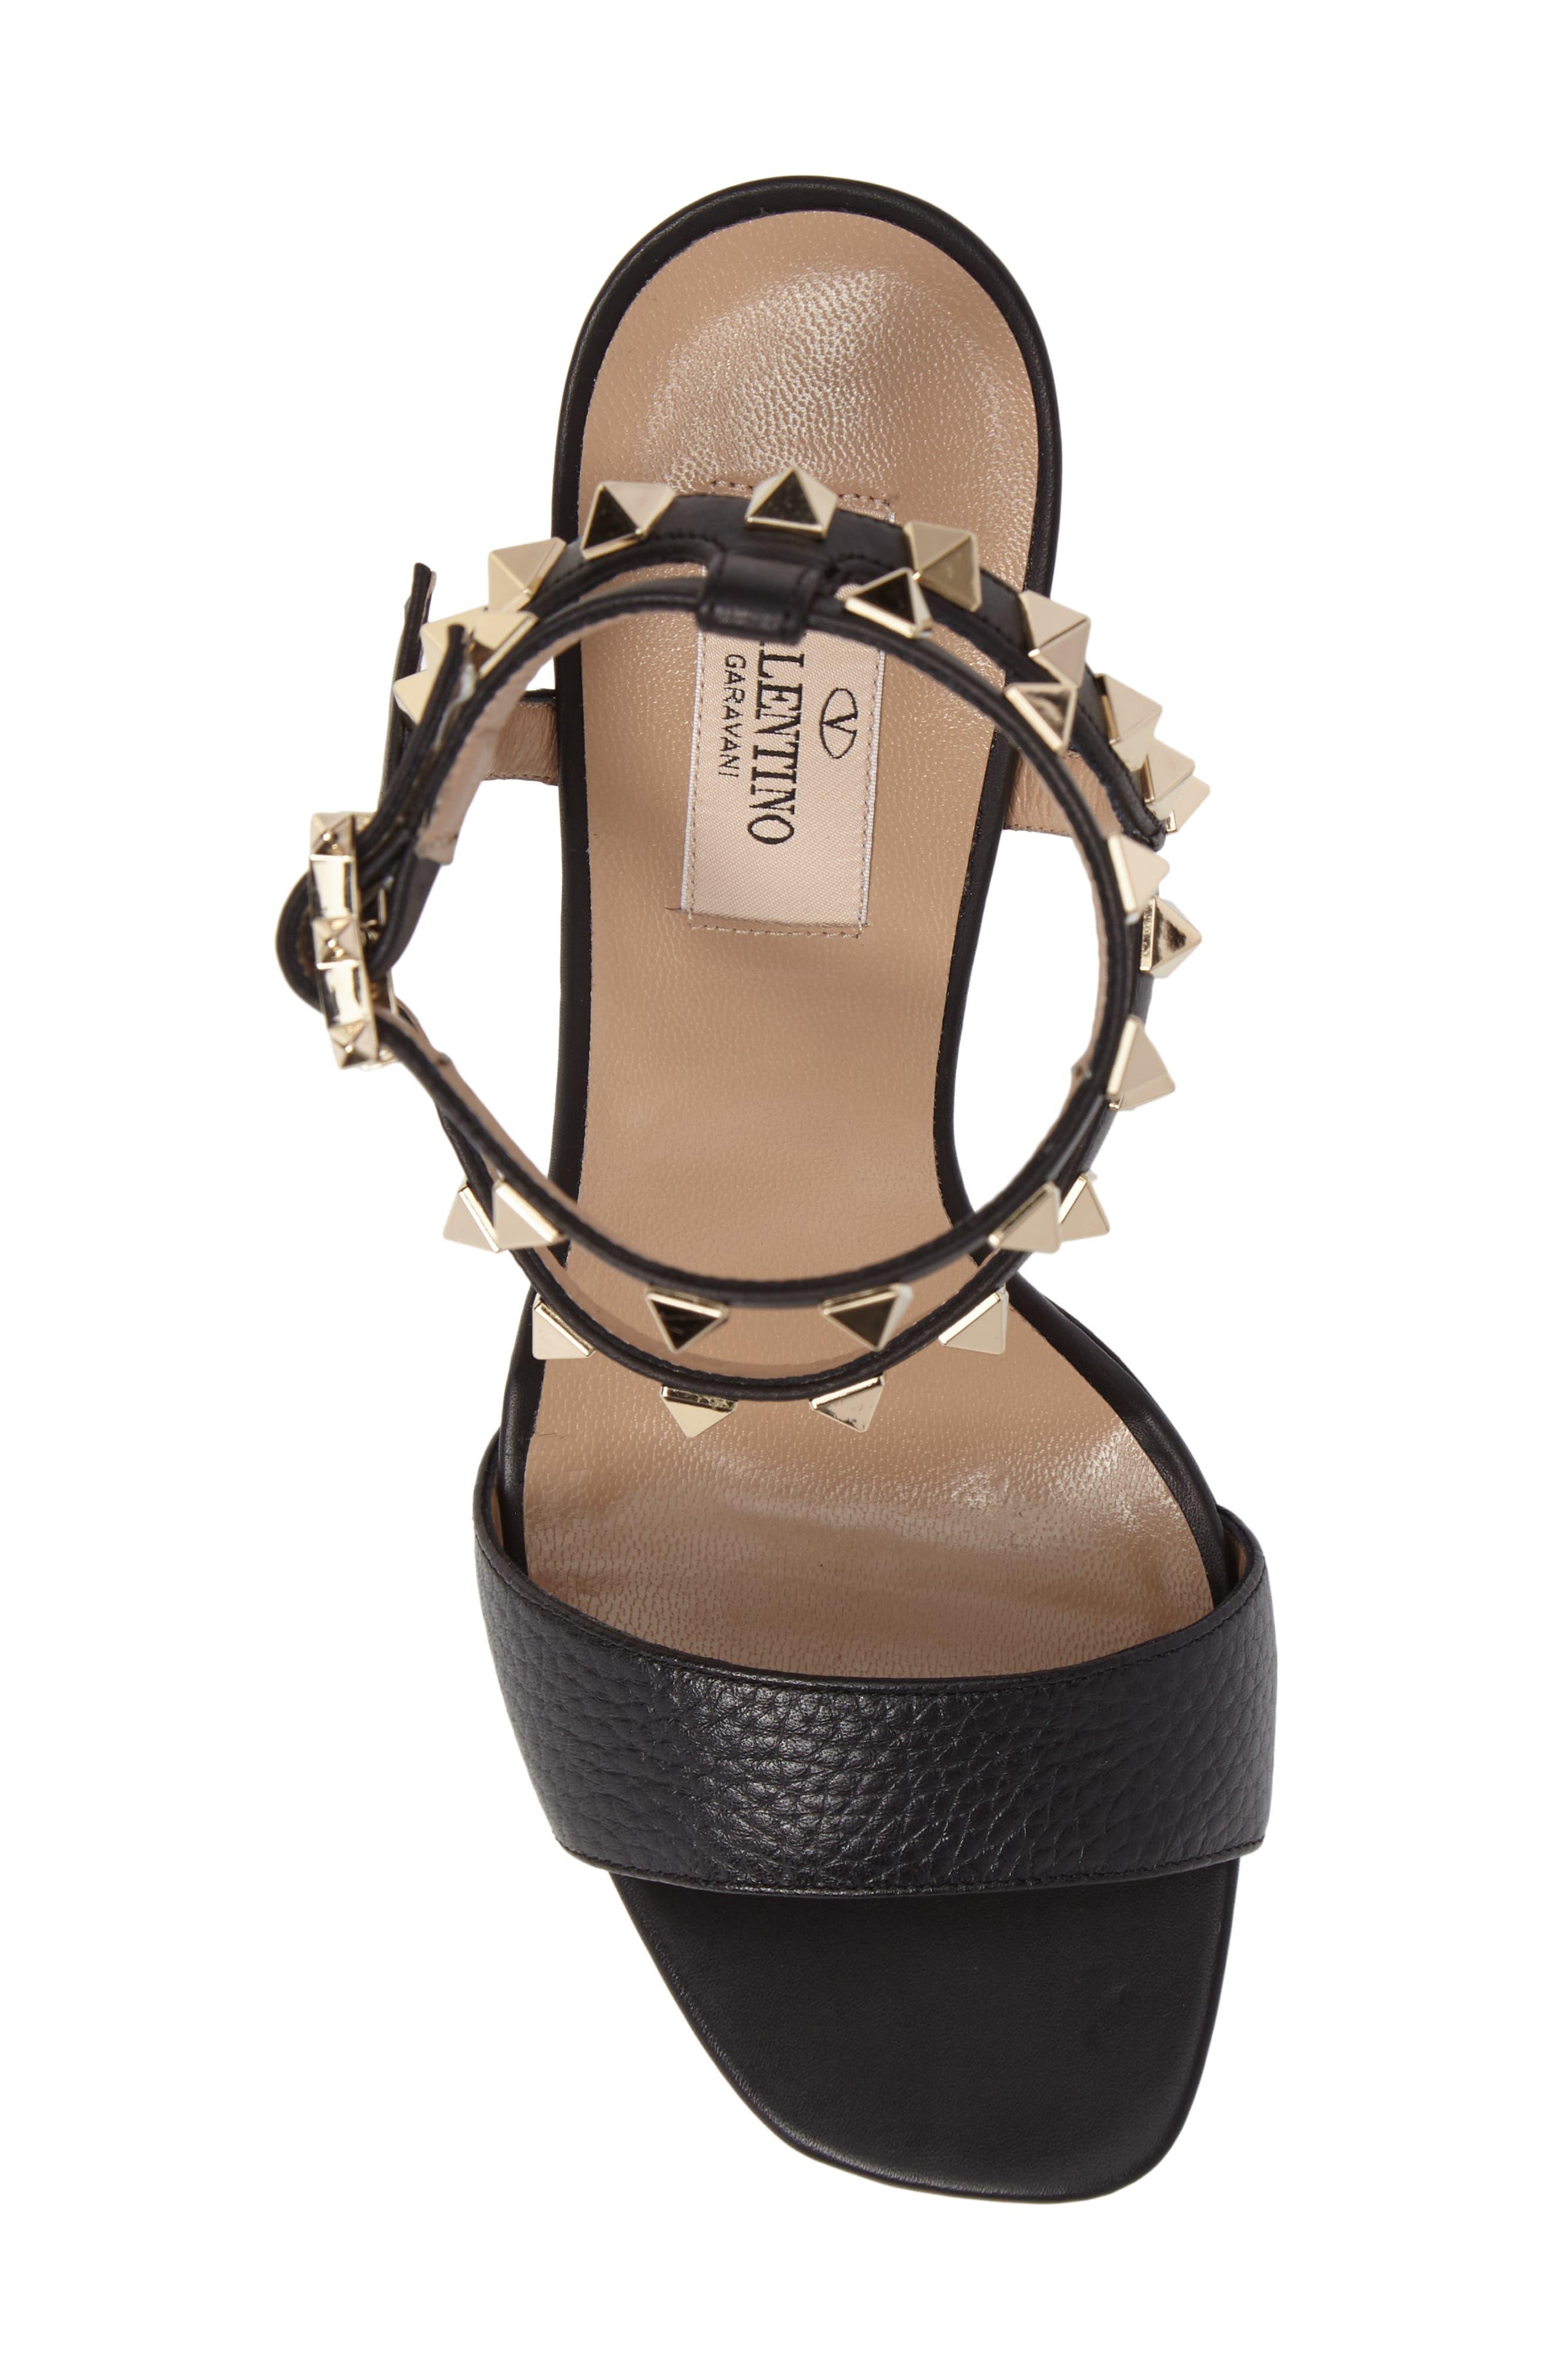 Rockstud Ankle Strap Sandal,                             Alternate thumbnail 5, color,                             BLACK